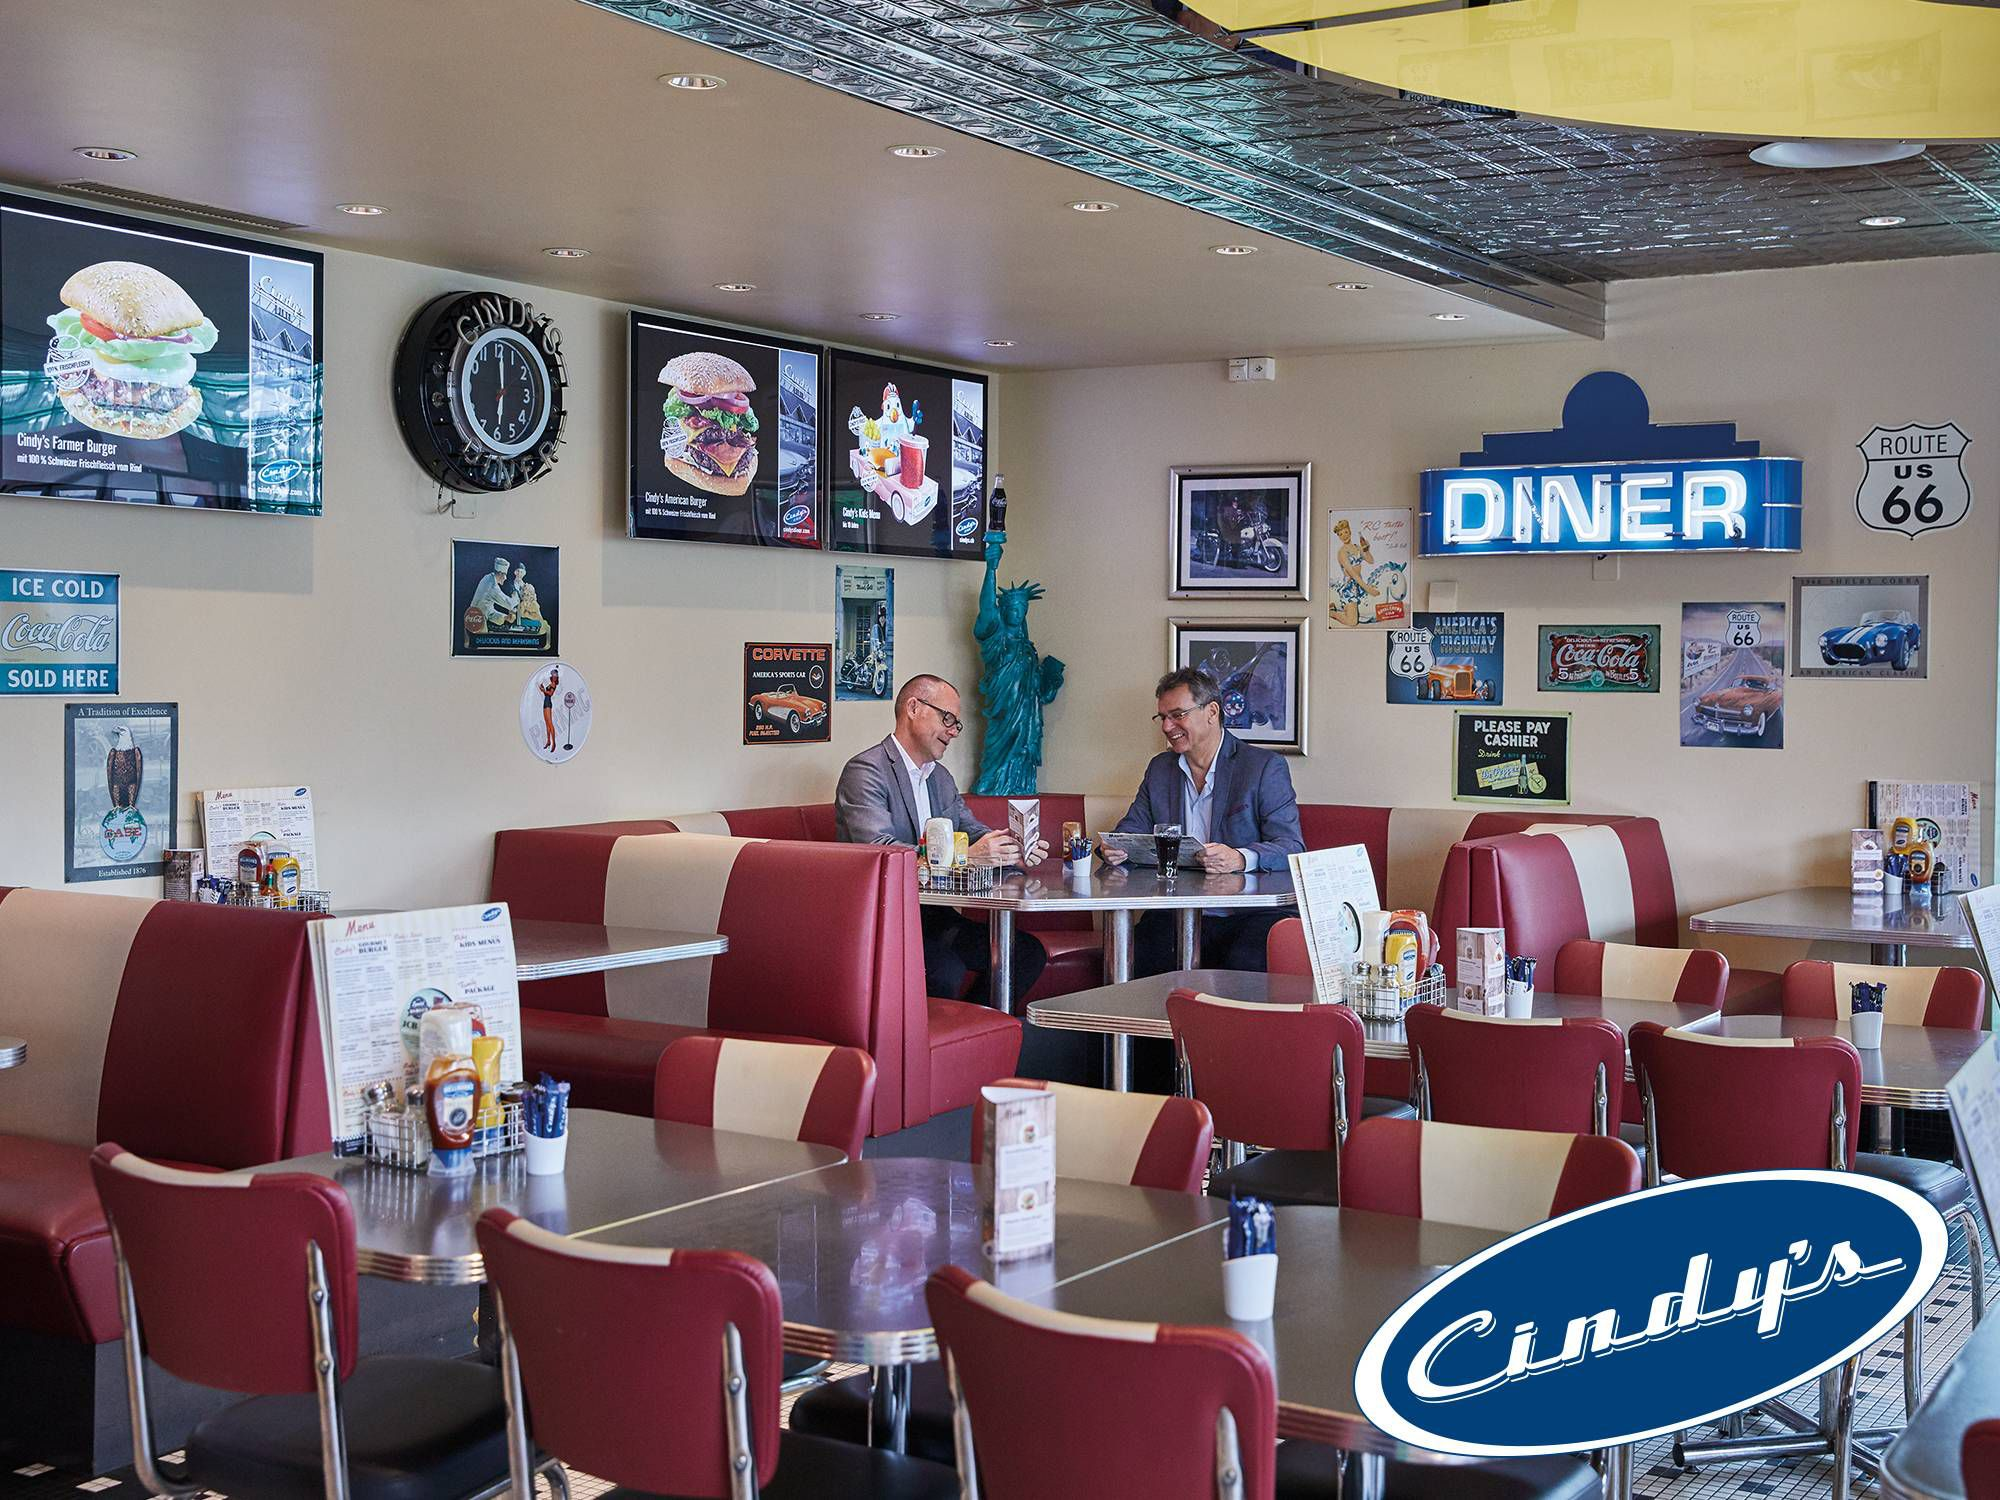 Restaurante Cindy's Diner